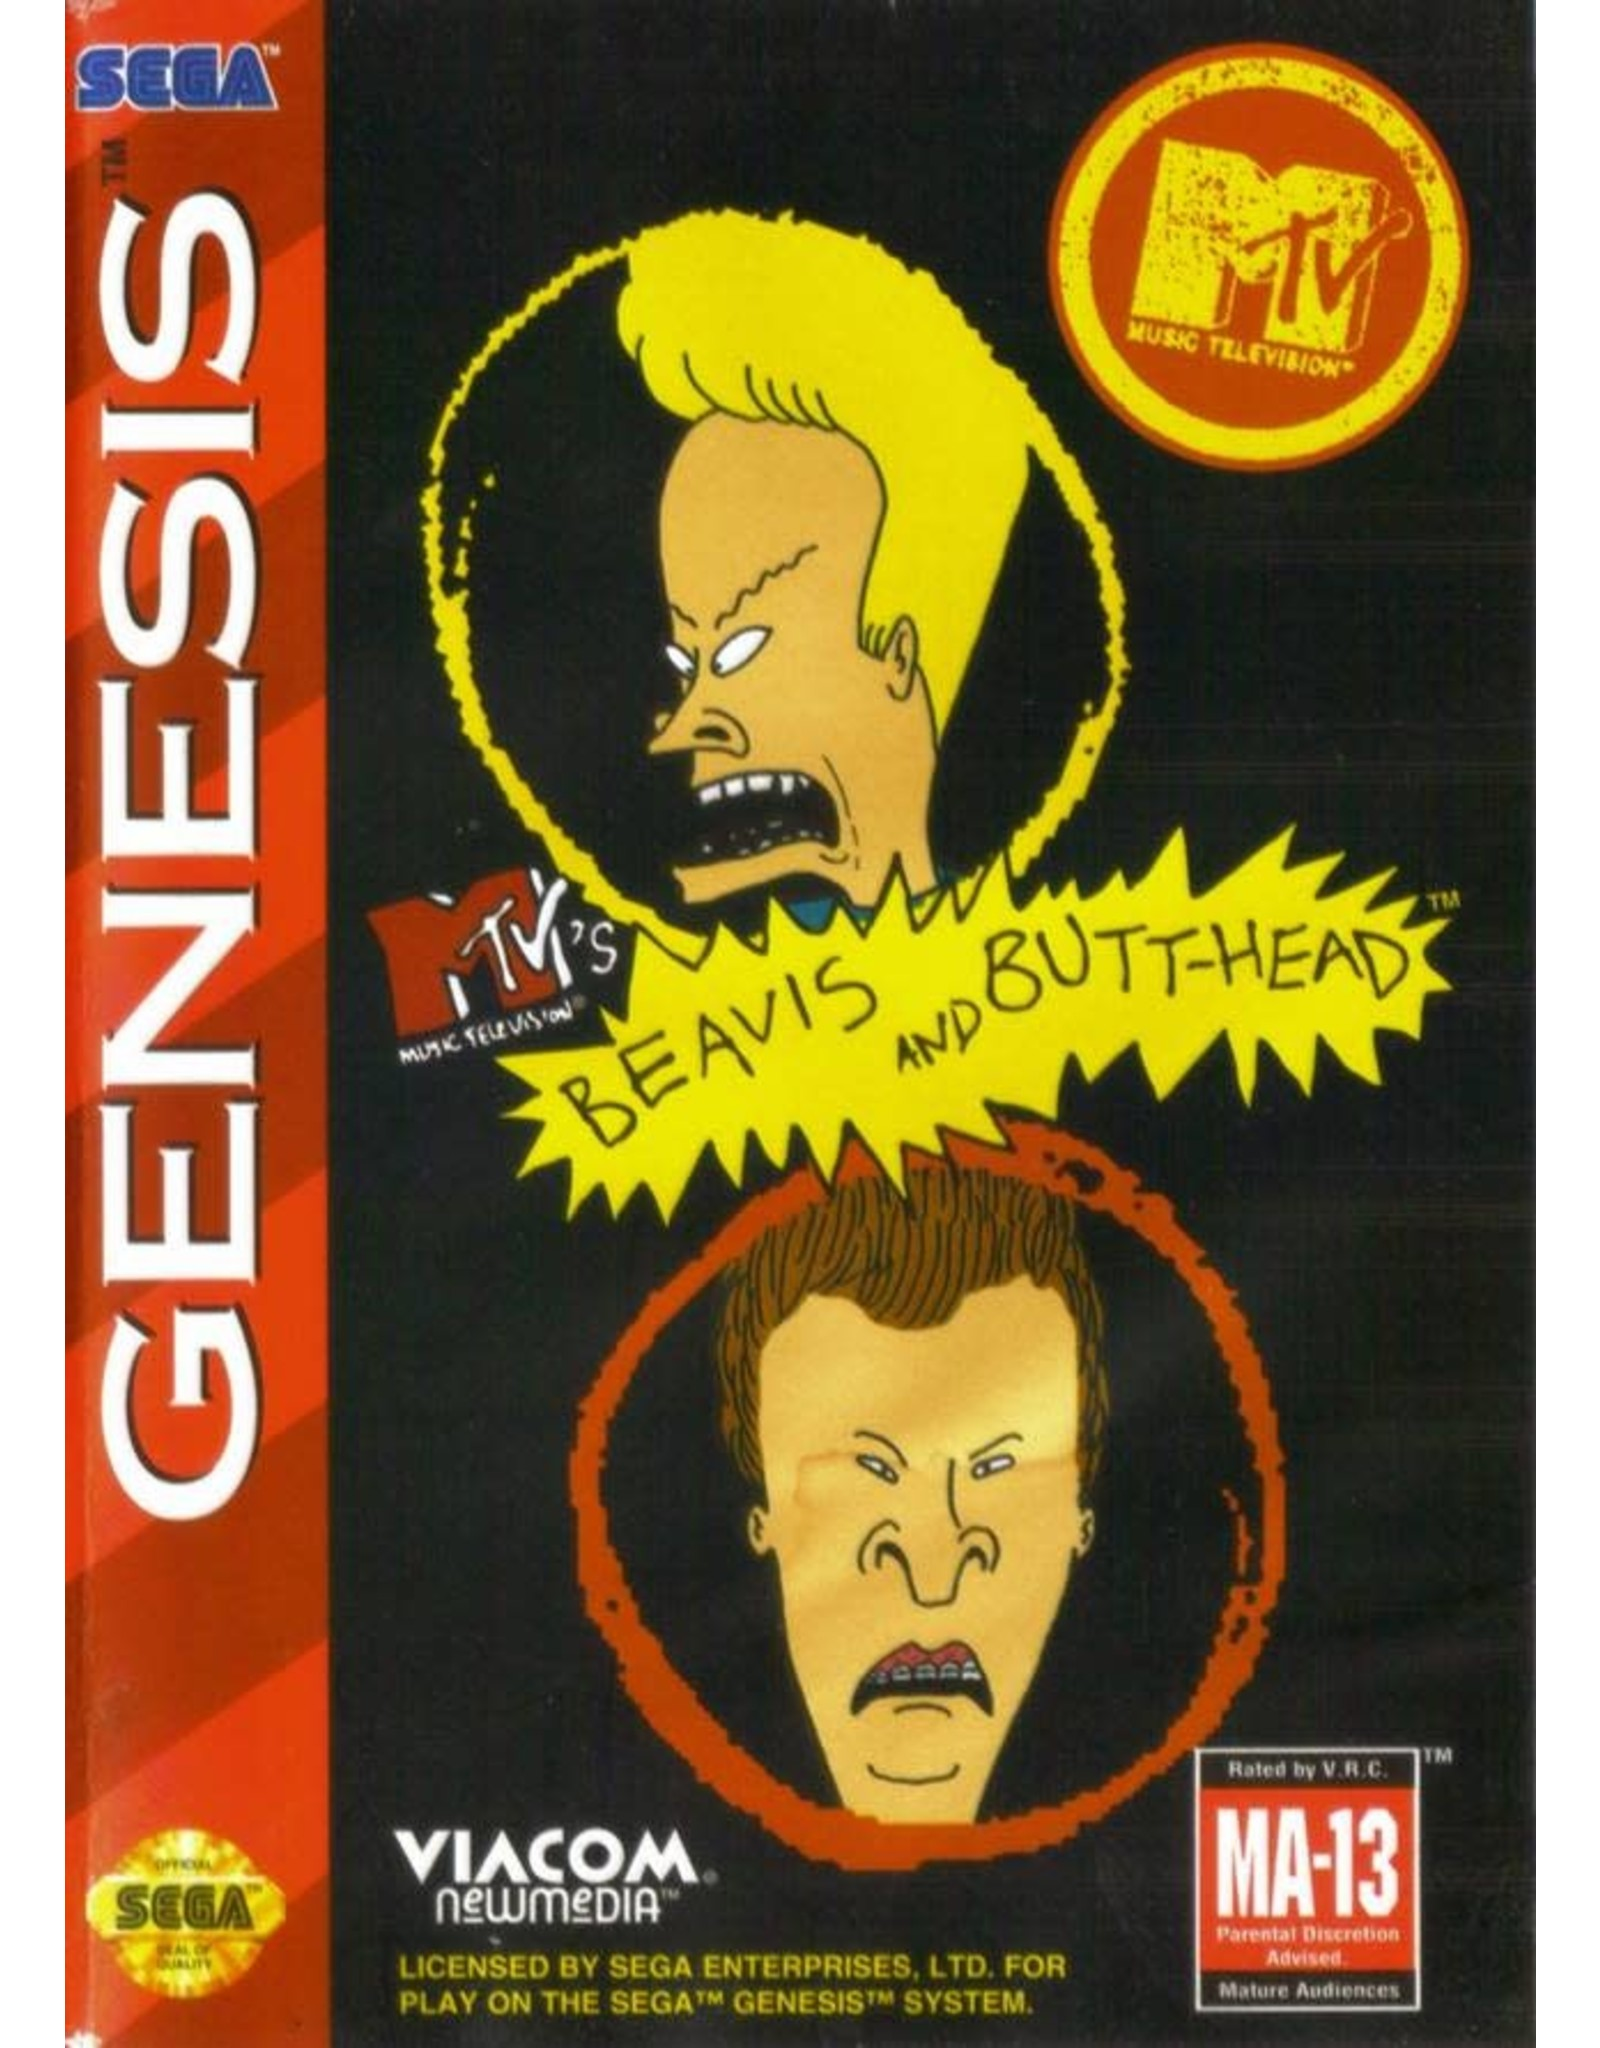 Sega Genesis Beavis and Butthead (Cart Only, Damaged Label)